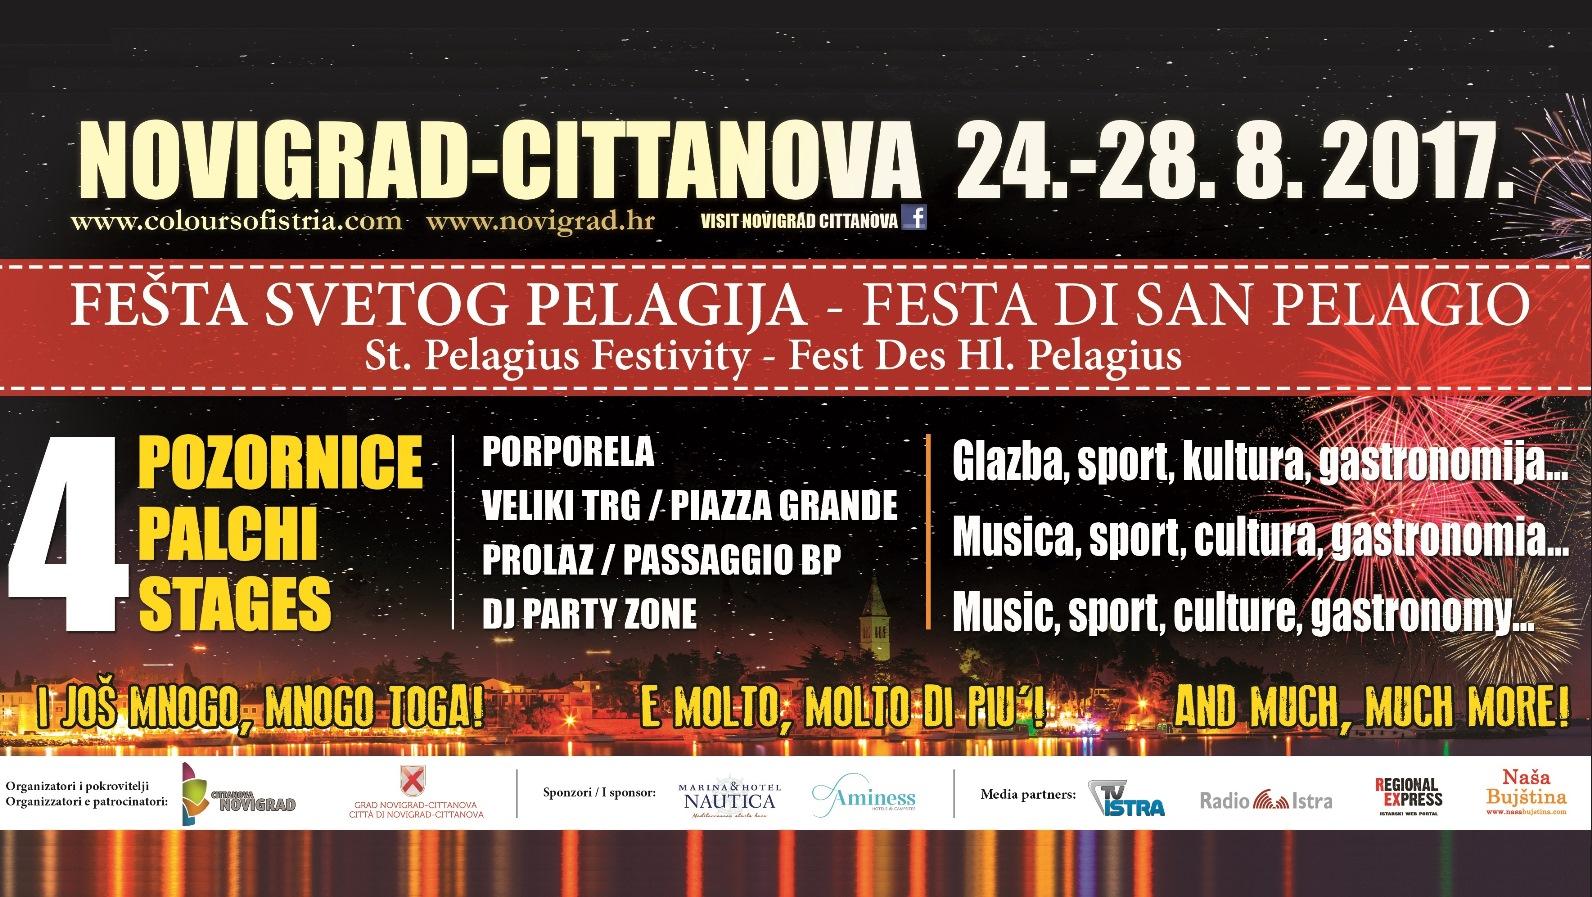 http://www.novigrad.hr/bogat_program_proslave_gradskog_sveca_zashtitnika